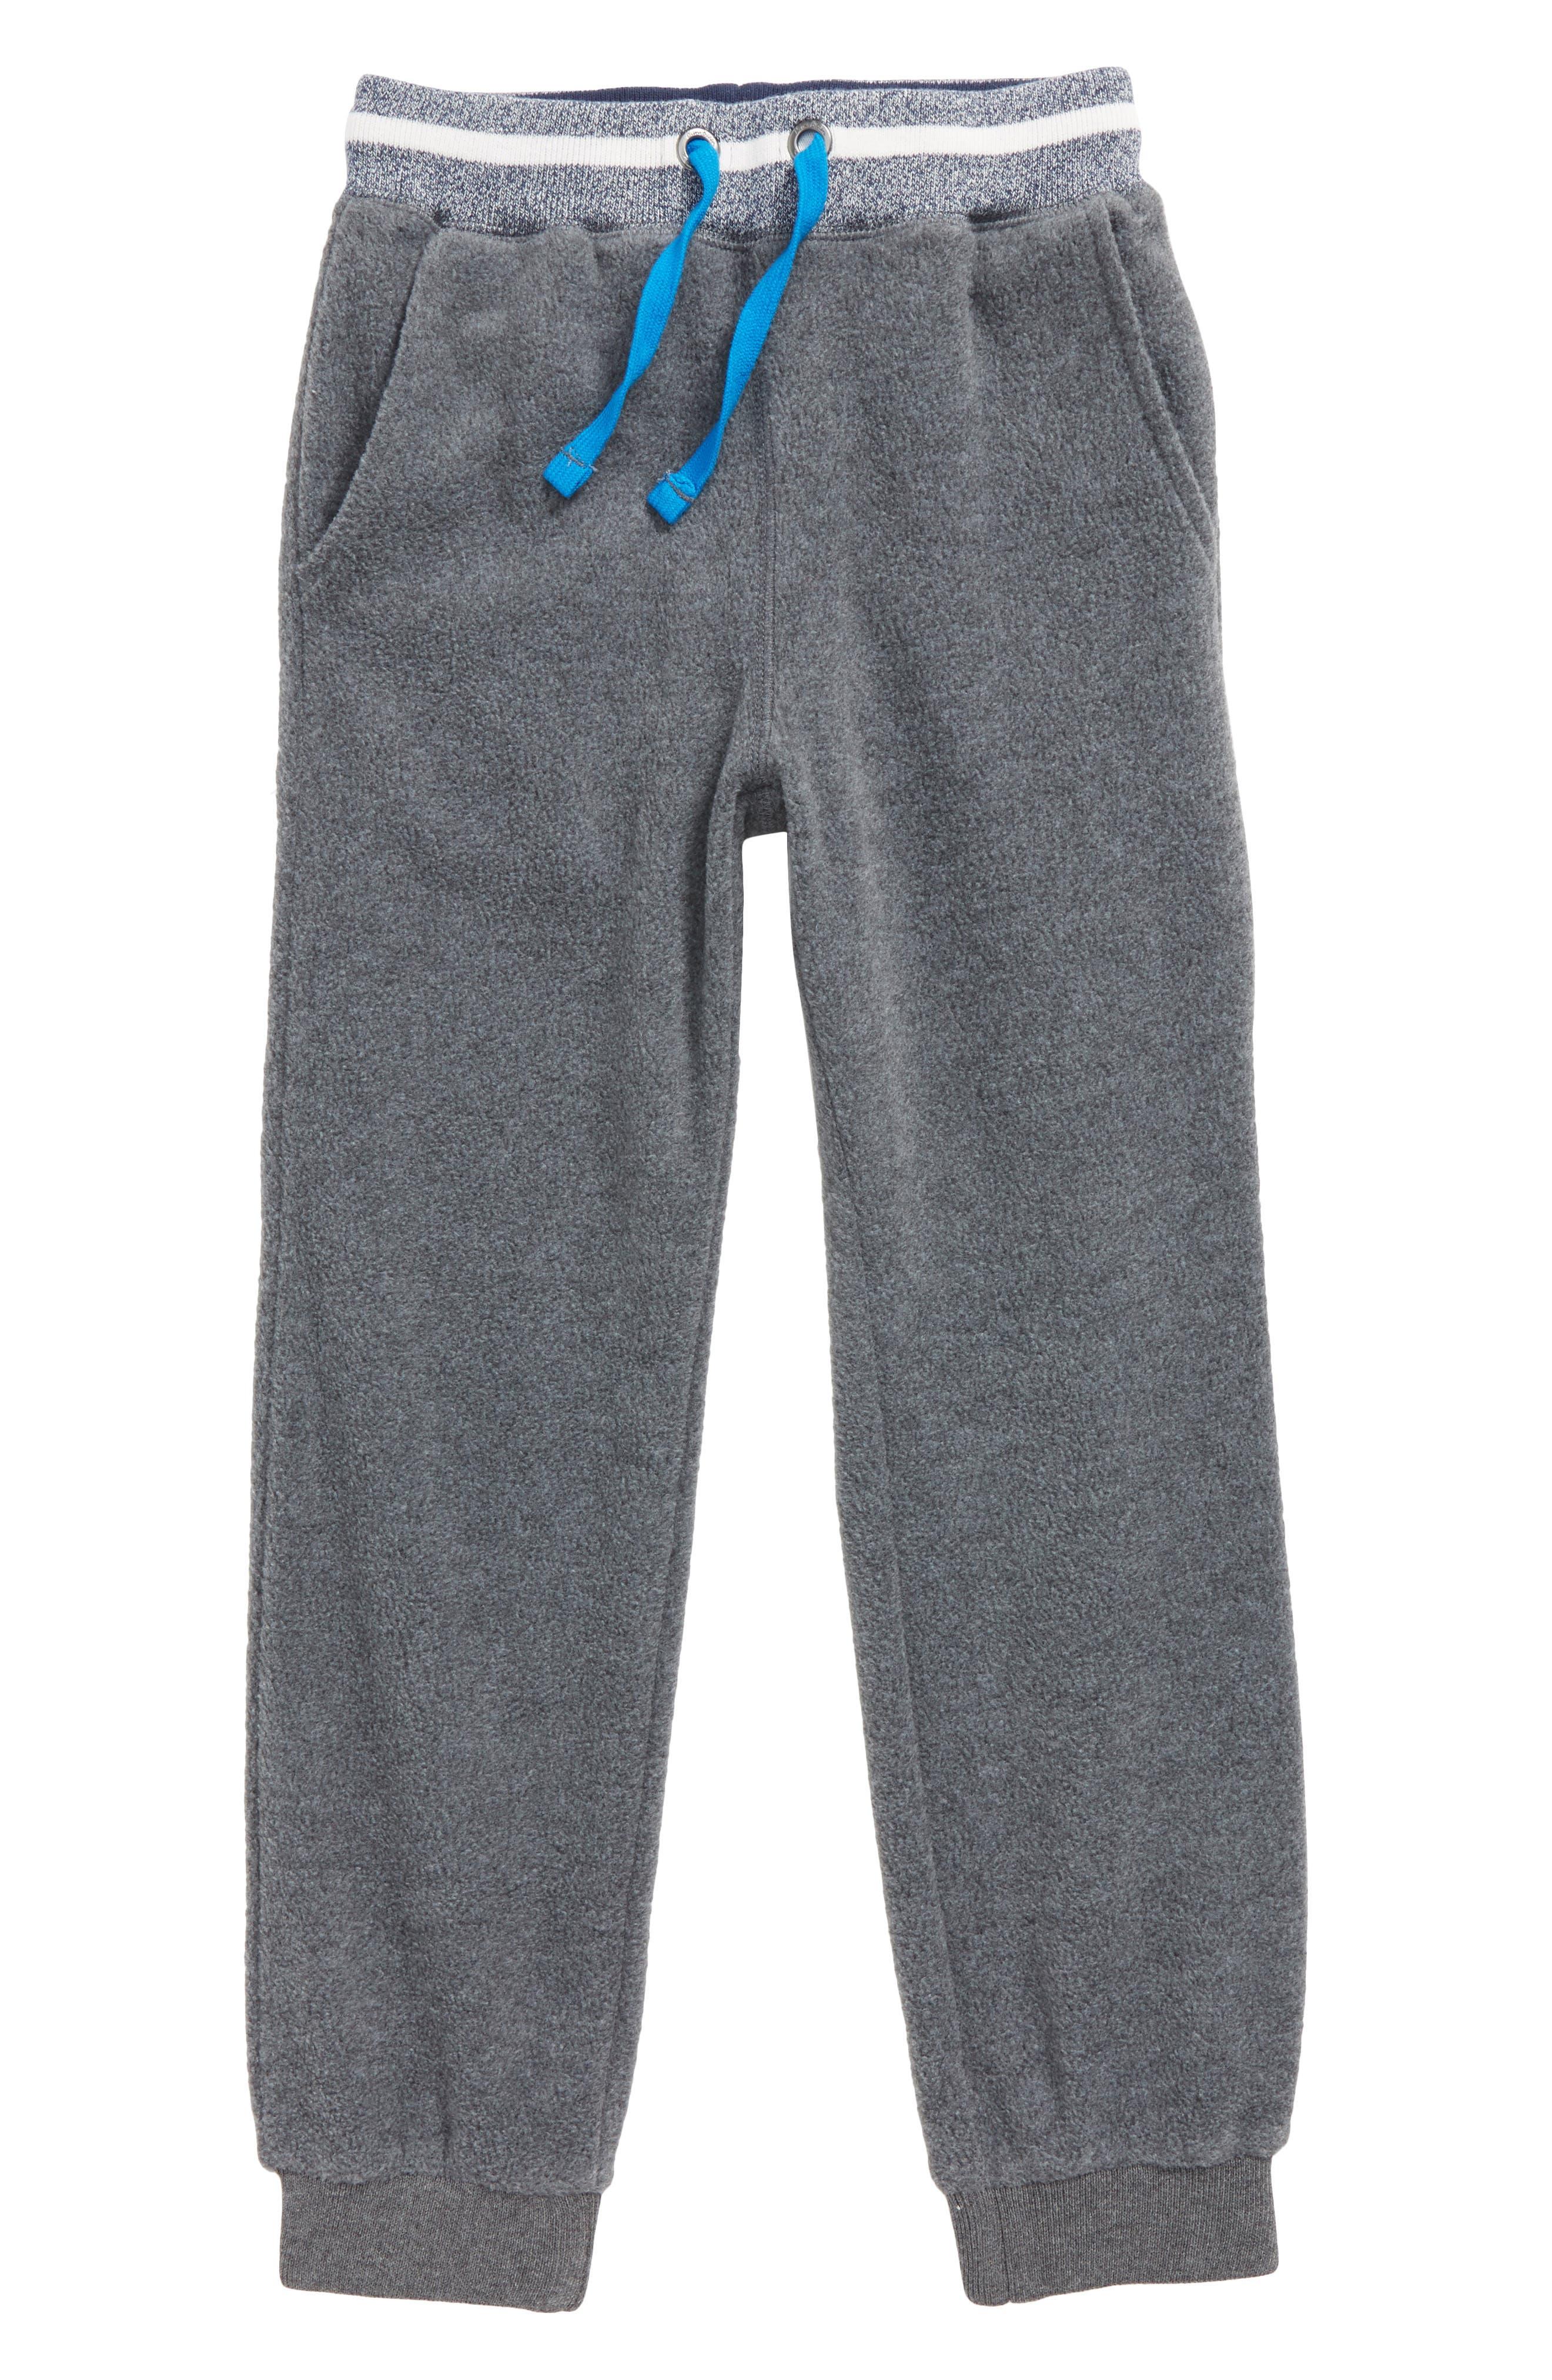 Microfleece Jogger Pants,                         Main,                         color, 024